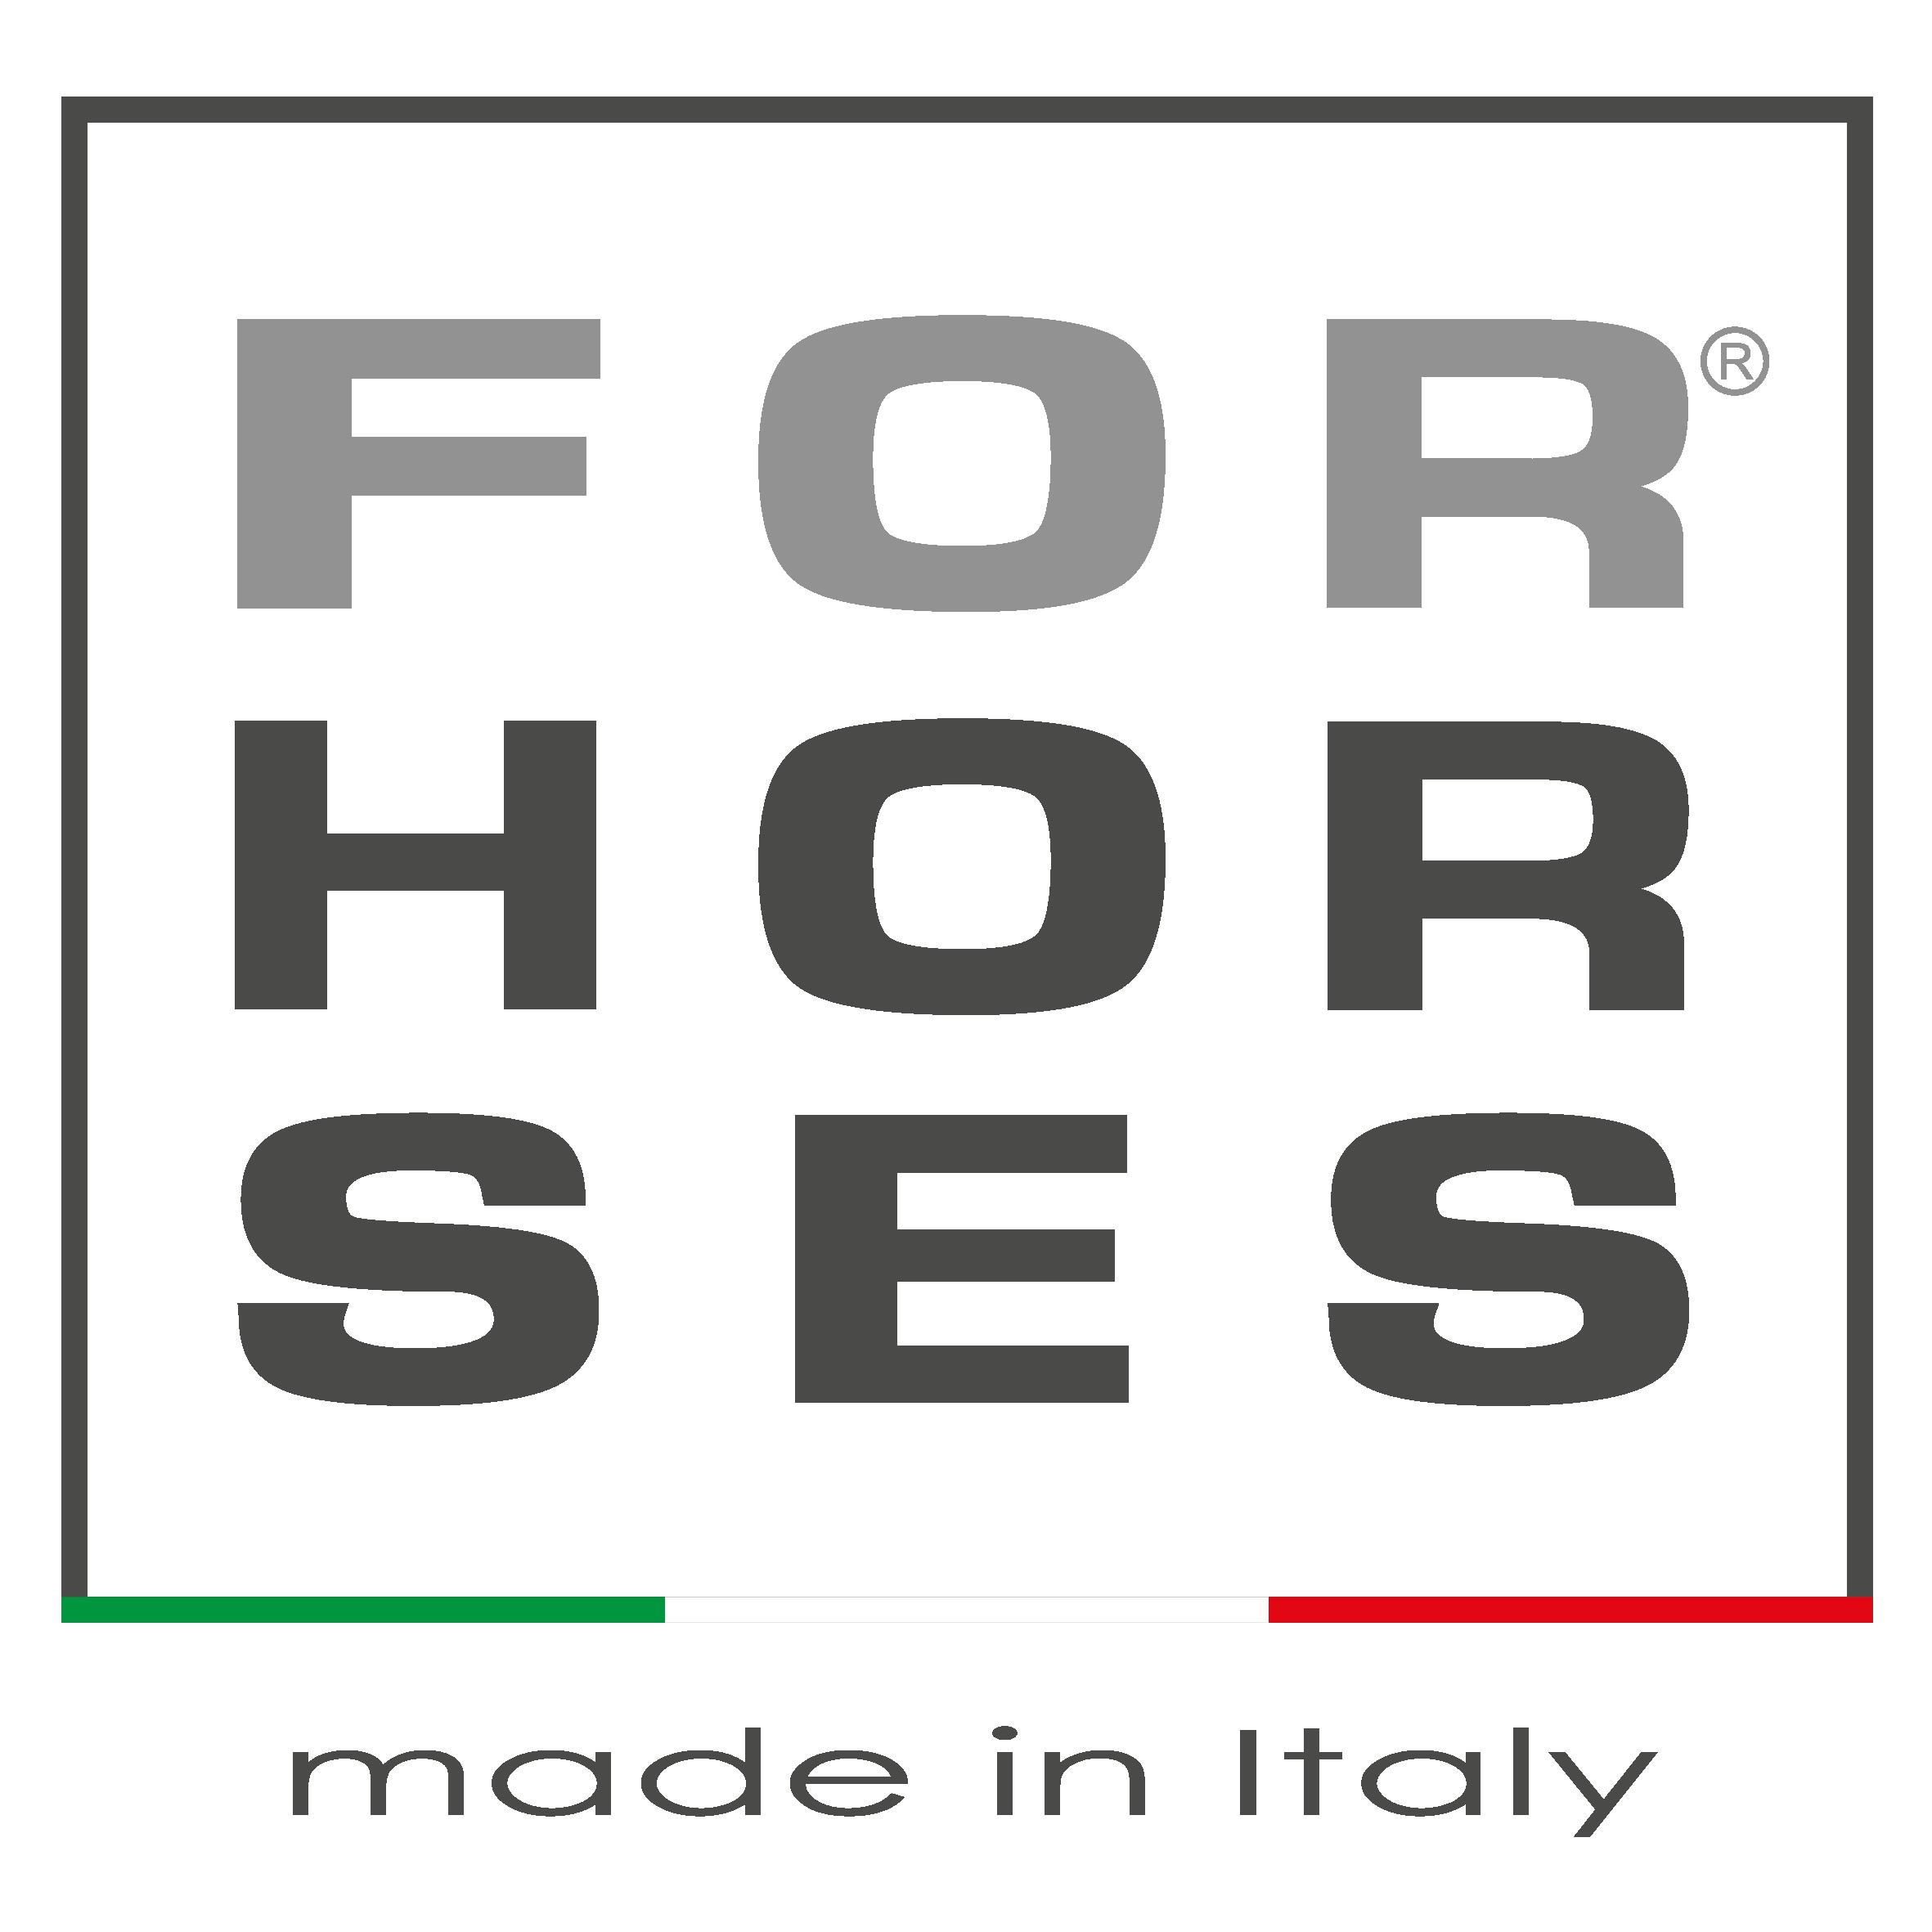 logo azienda For Horses produzione di mascherine e capi di abbigliamento per l'equitazione